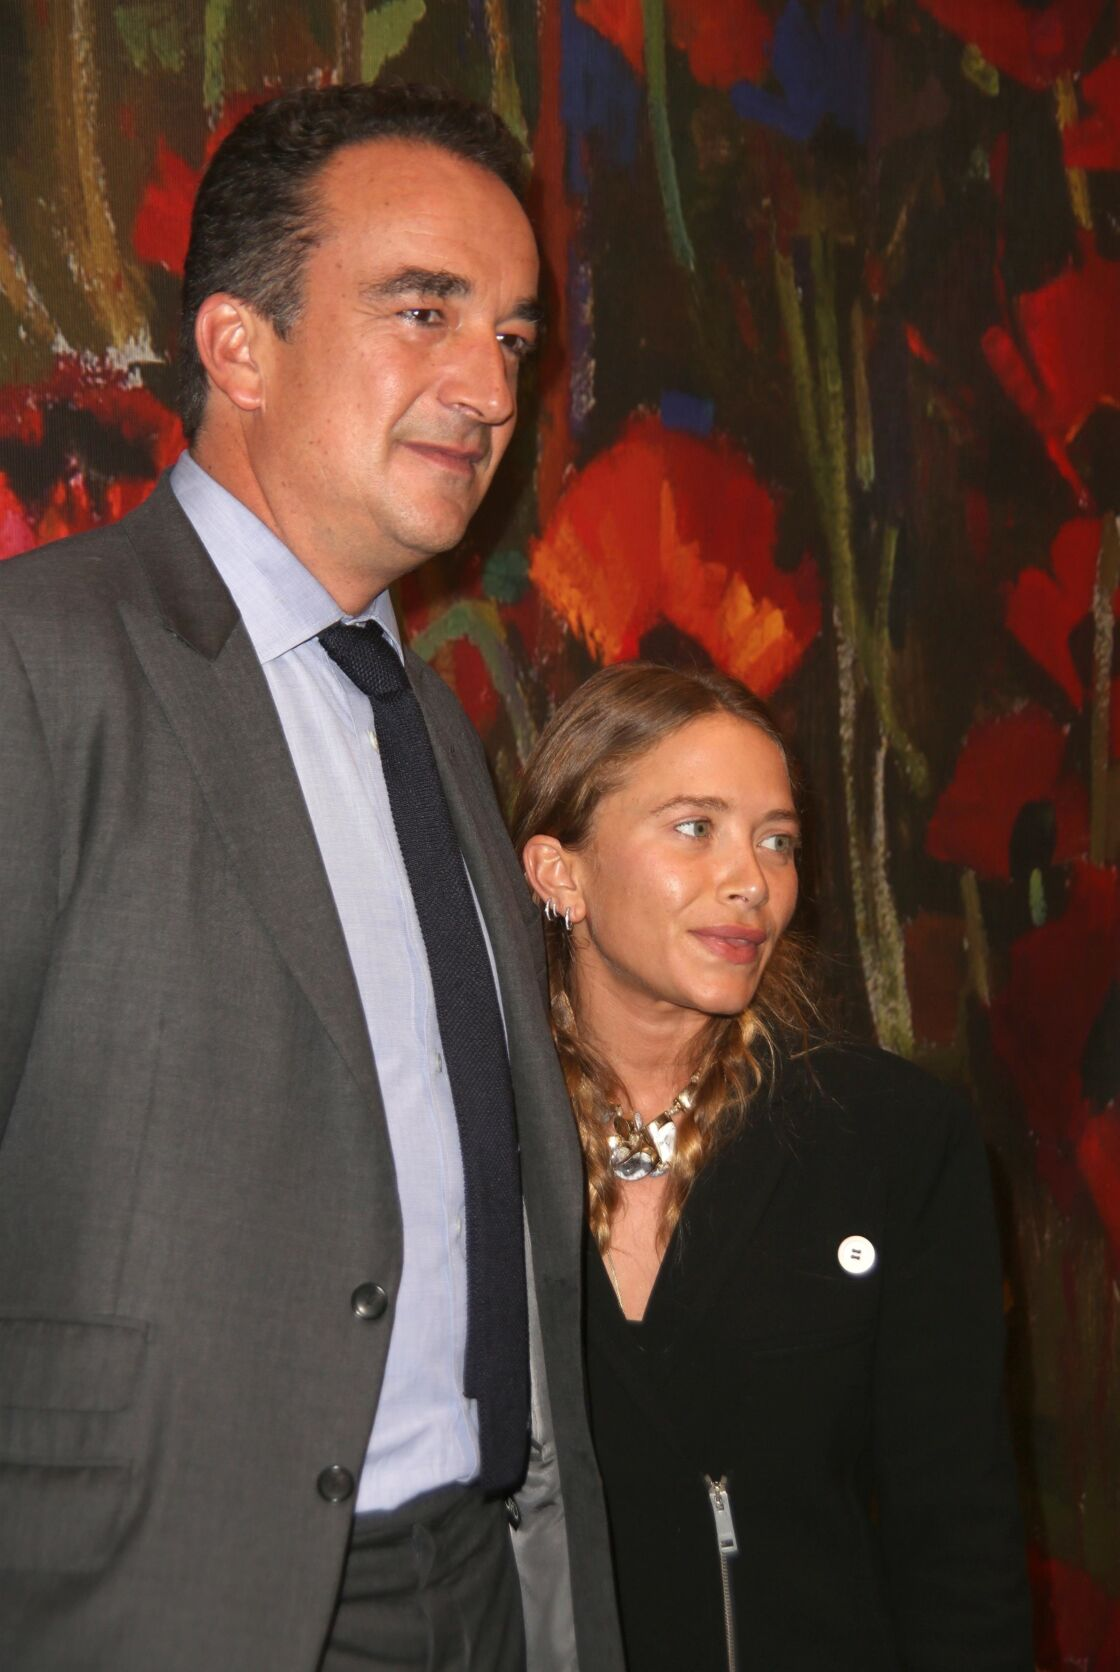 Mary Kate Olsen et Olivier Sarkozy en octobre 2017